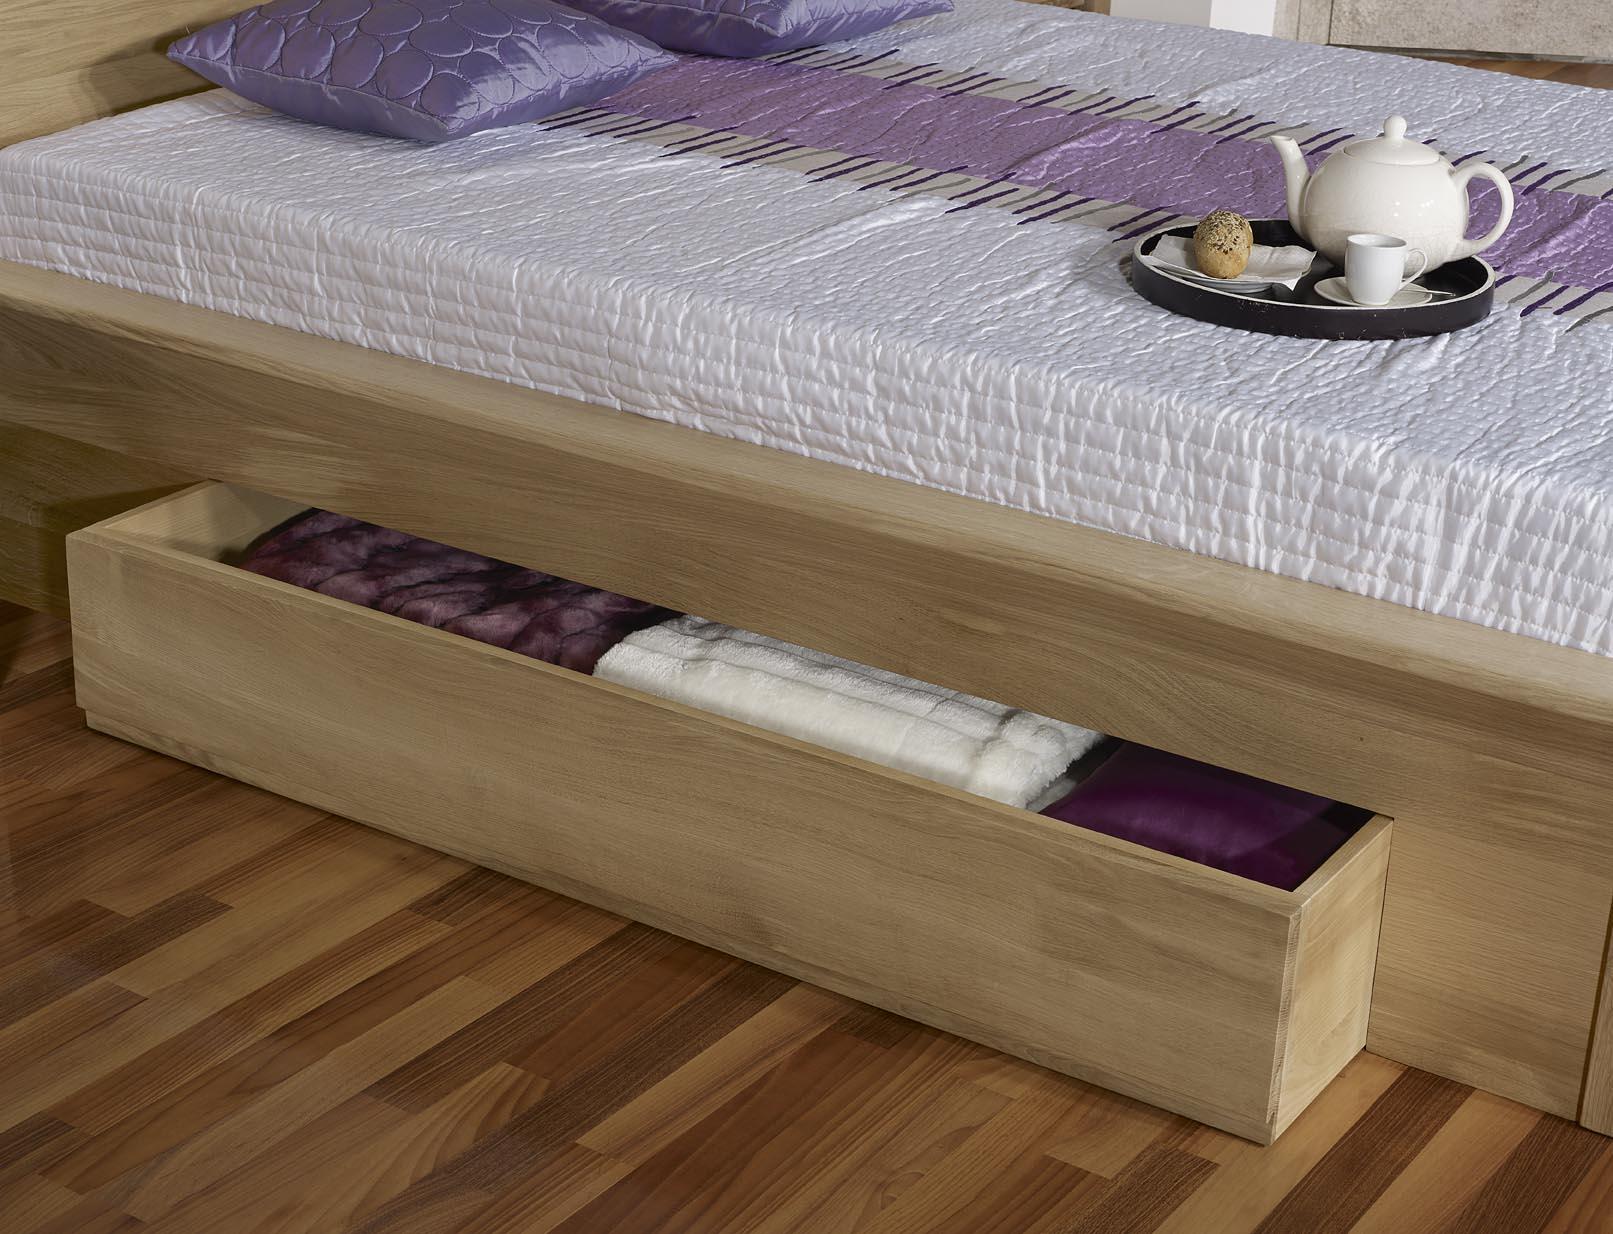 lit collection nature 120 190 en ch ne massif avec tiroirs. Black Bedroom Furniture Sets. Home Design Ideas